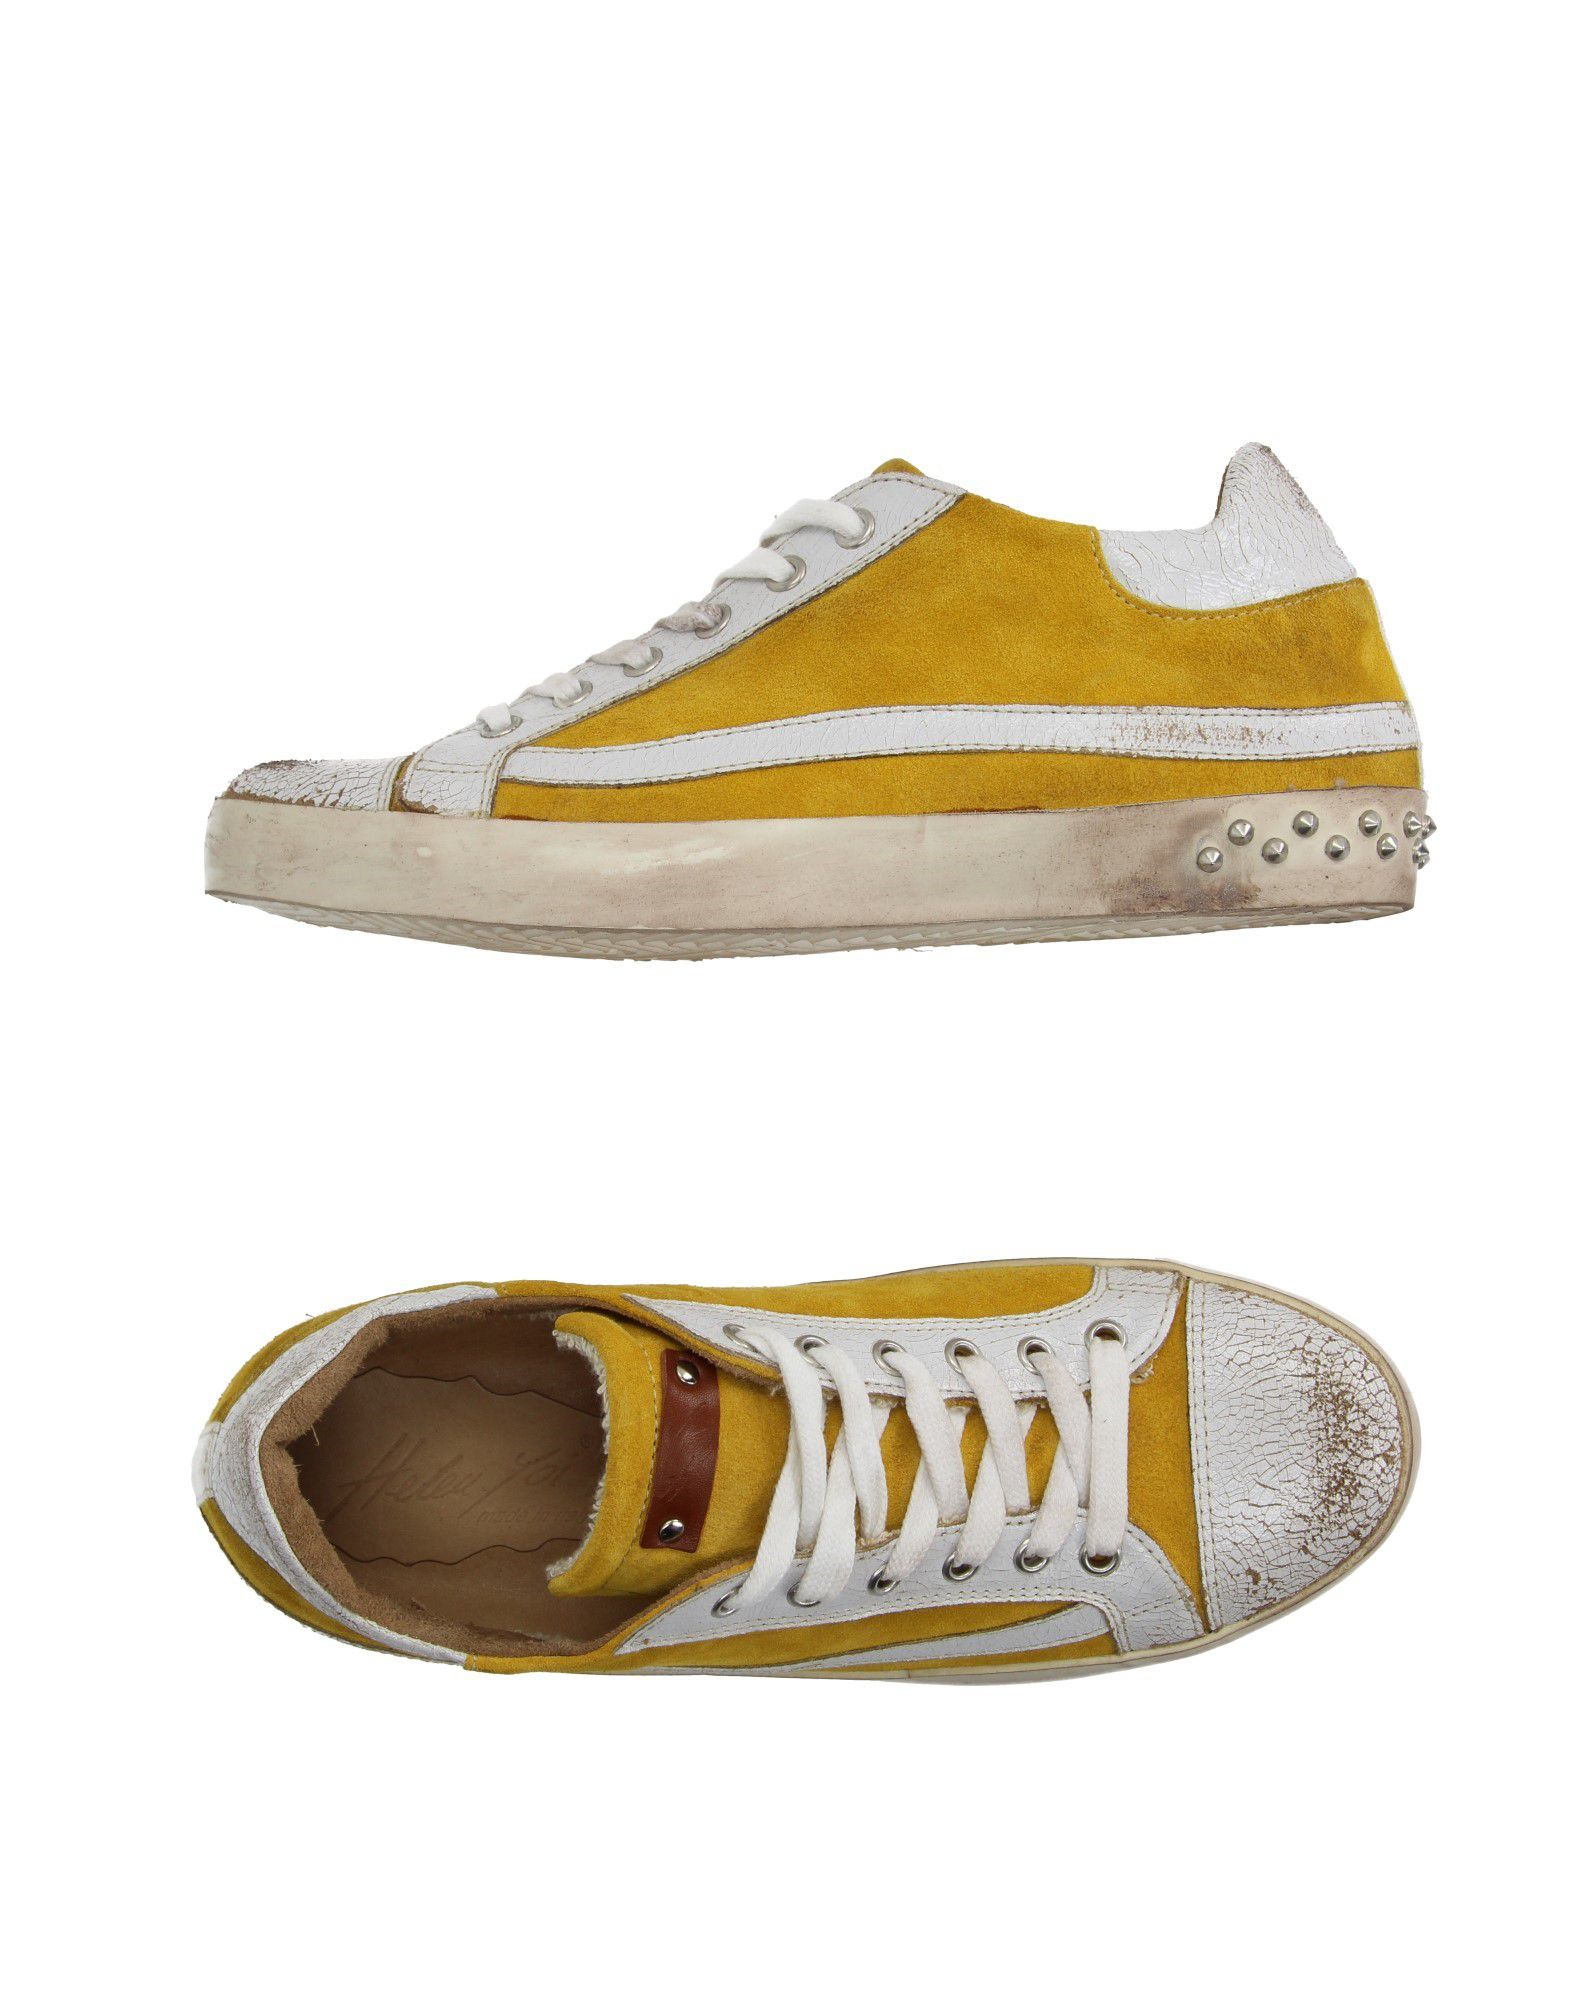 FOOTWEAR - Low-tops & sneakers Helen Yoi pOcDrEg